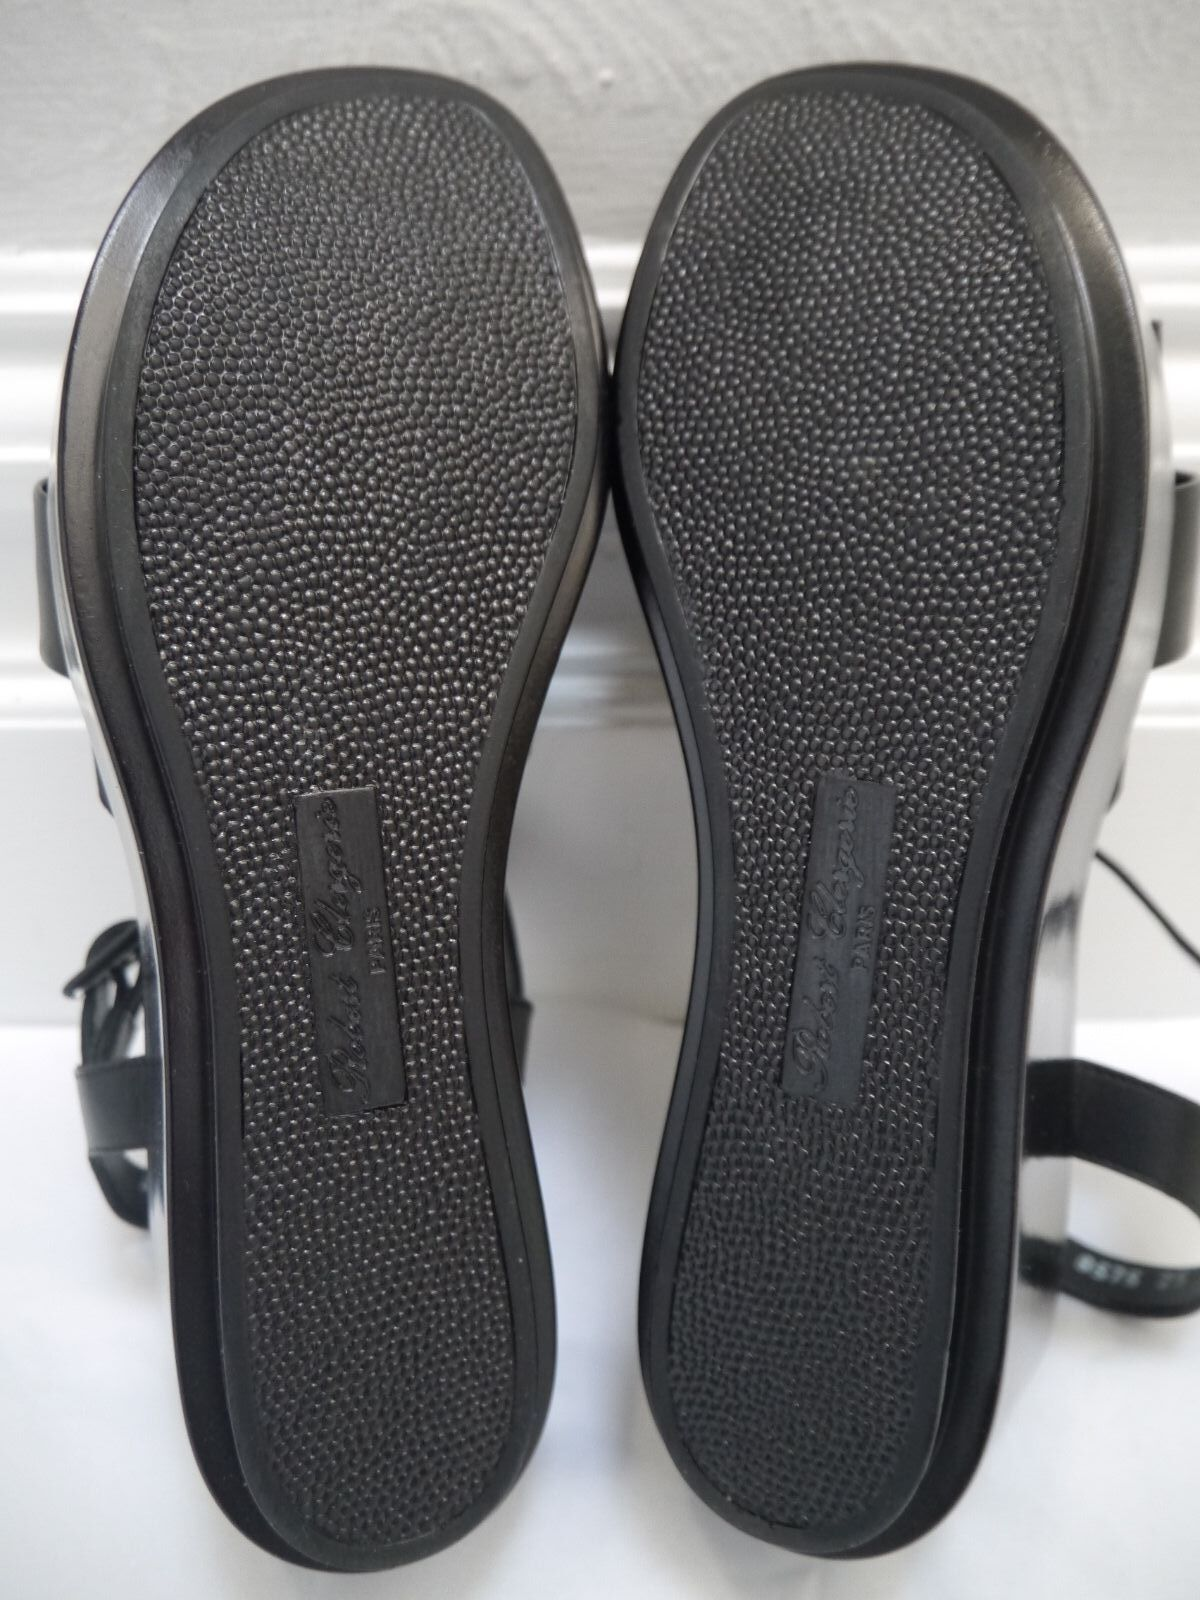 NEW ROBERT CLERGERIE black leather platform sandals size 40.5 40.5 40.5 run small 9 9.5 f314eb